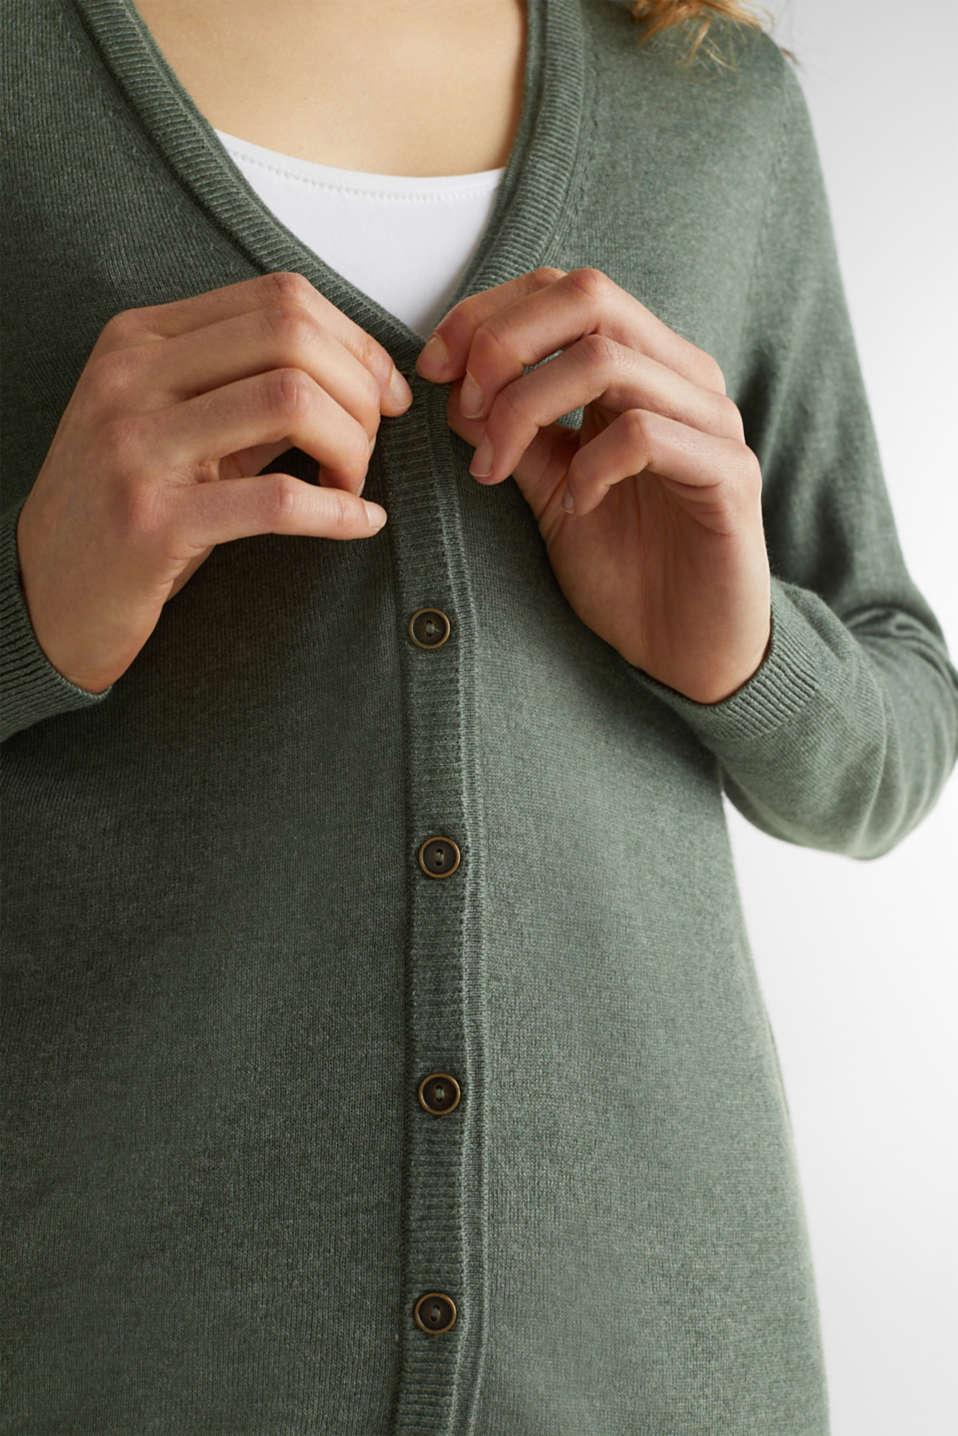 Fine-knit blended cotton cardigan, KHAKI GREEN 5, detail image number 2